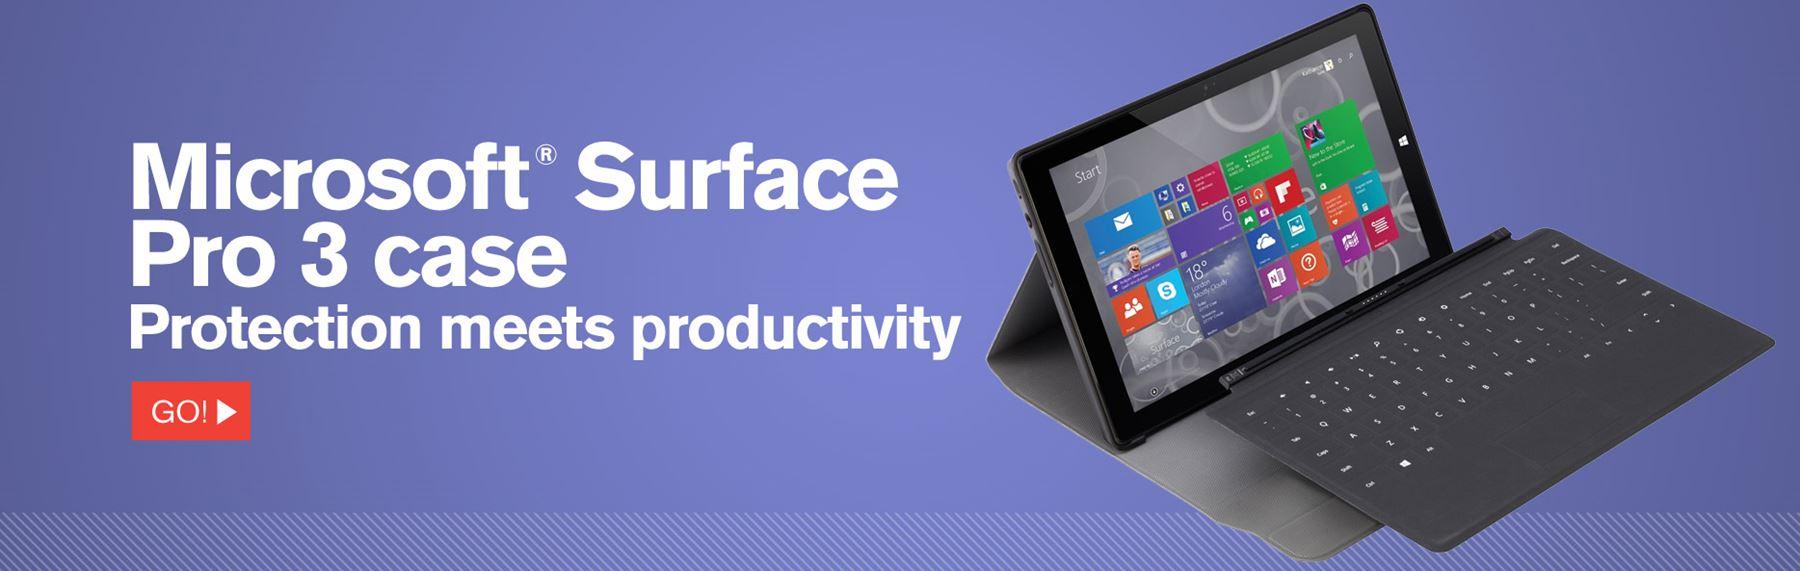 Microsoft Surface Pro 3 Case